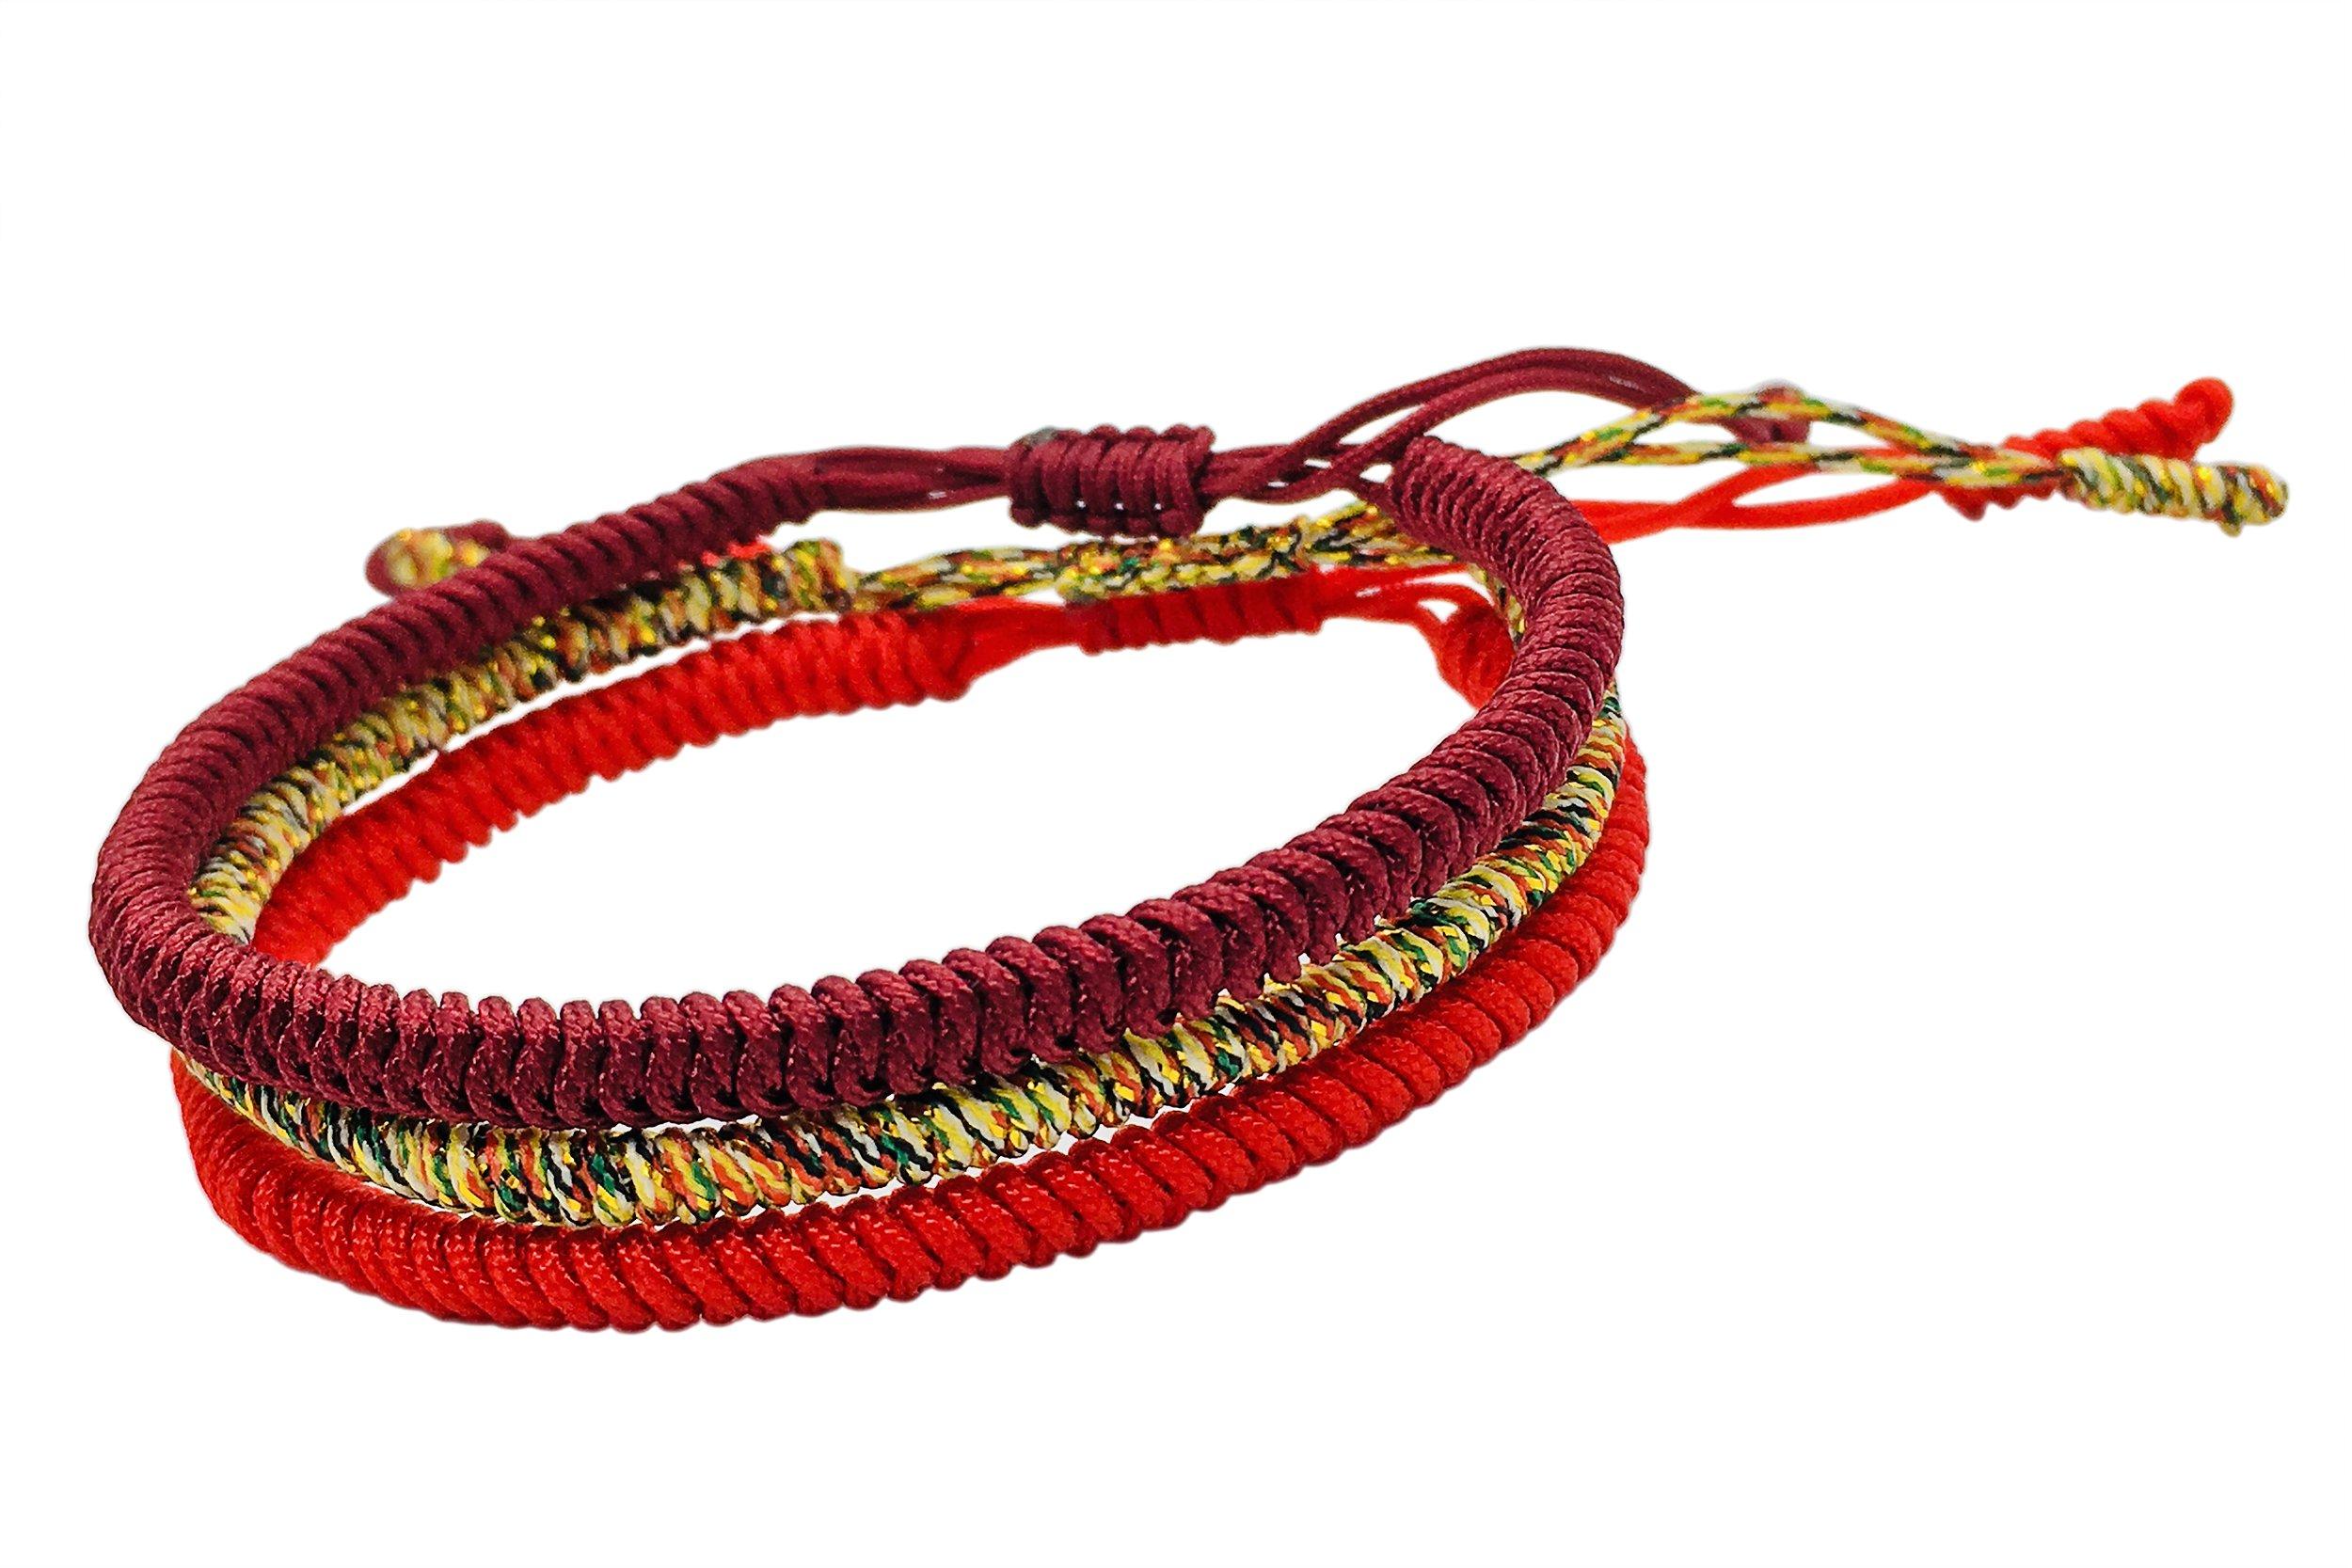 Tibetan Buddhist Handmade Lucky Knot Rope Bracelet (Set of 3 - Red, Deep Red, Multi-Golden)